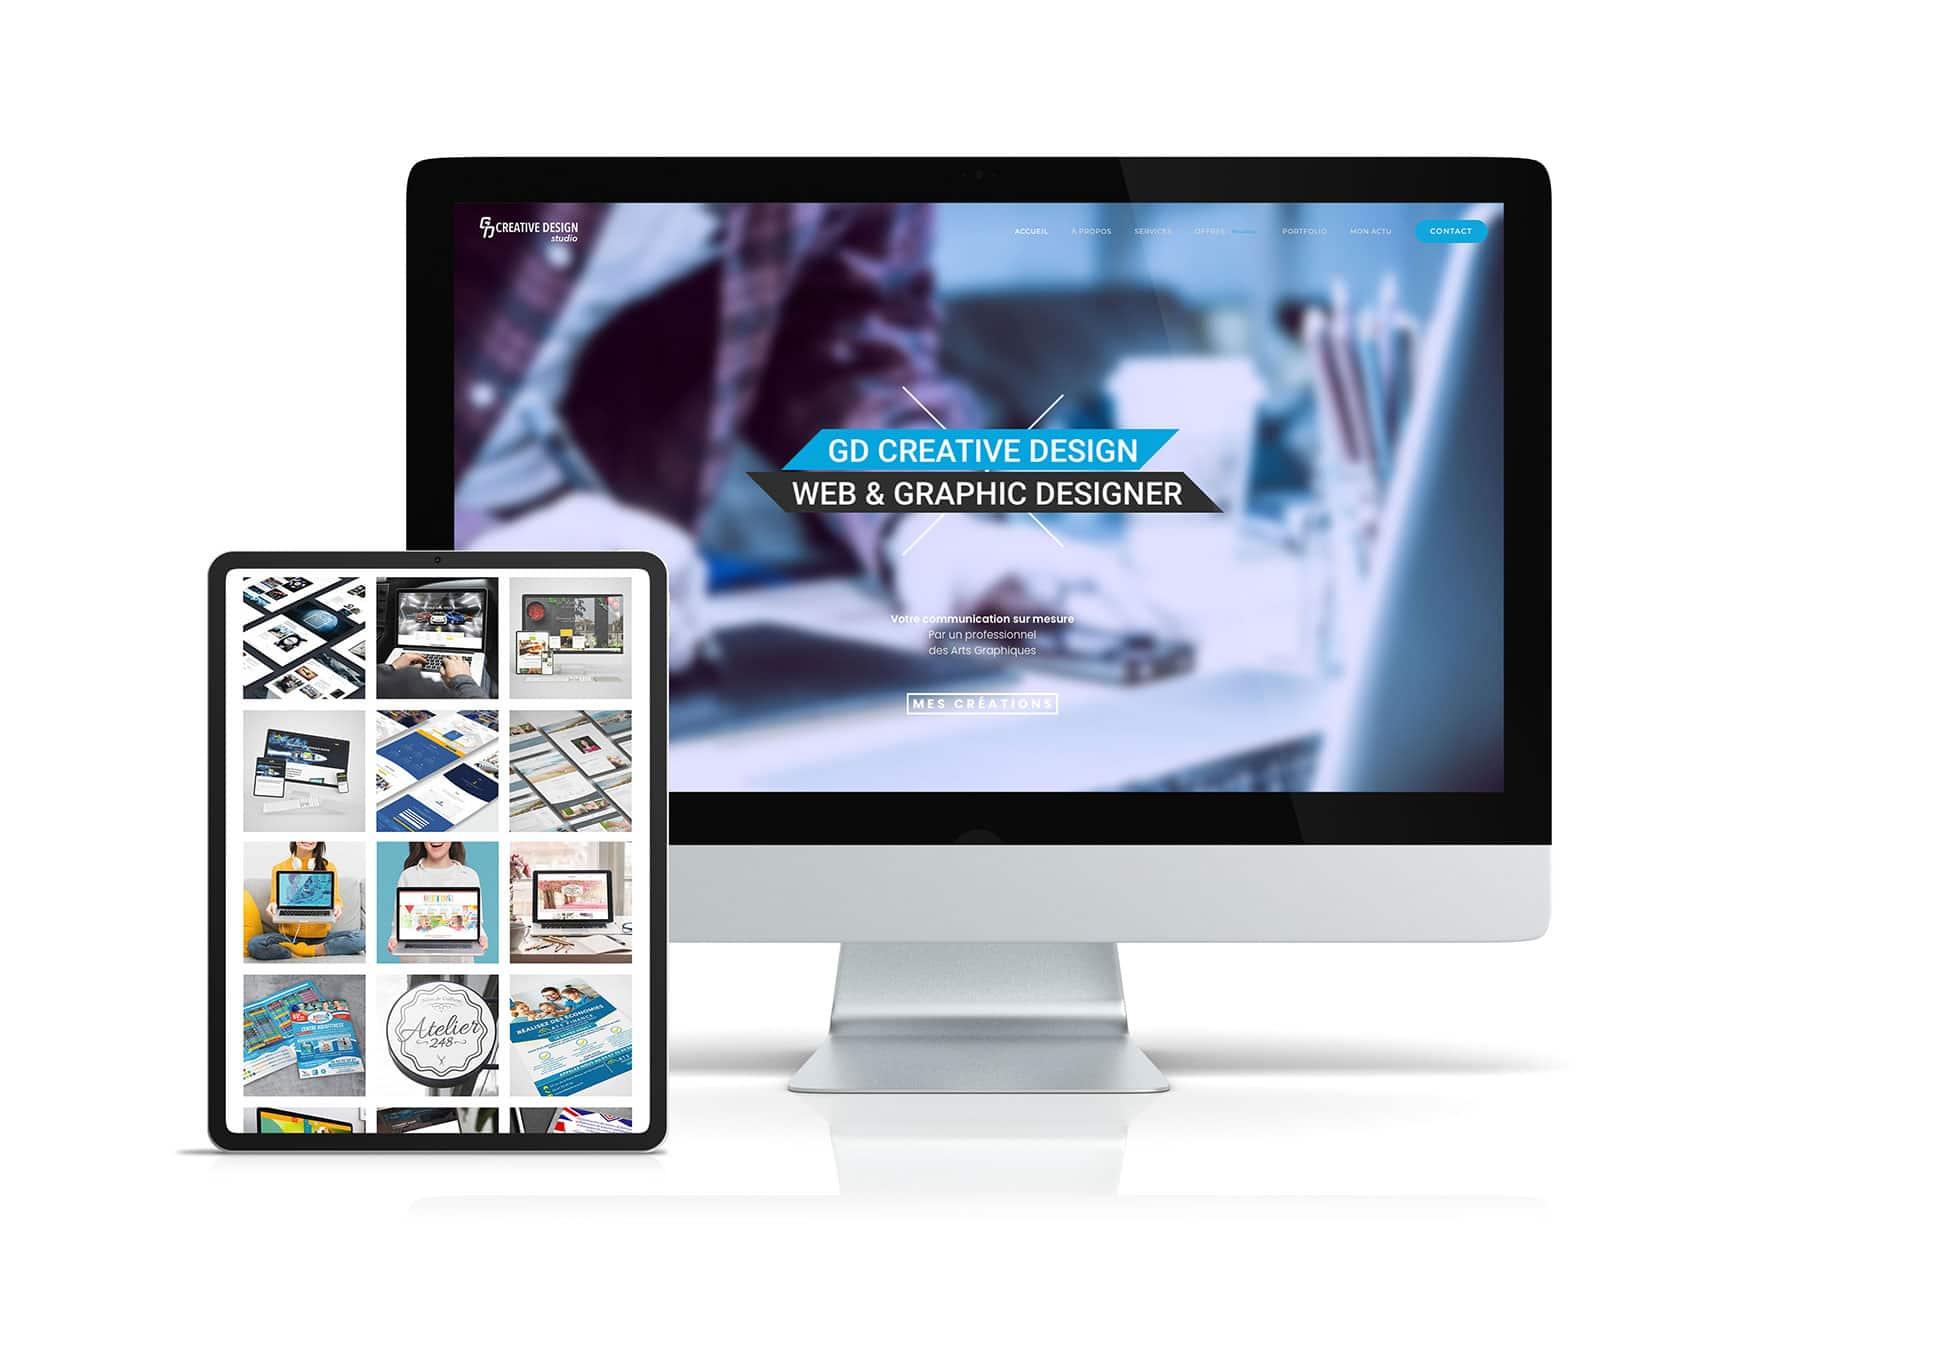 GD Creative Design Web designer et graphiste